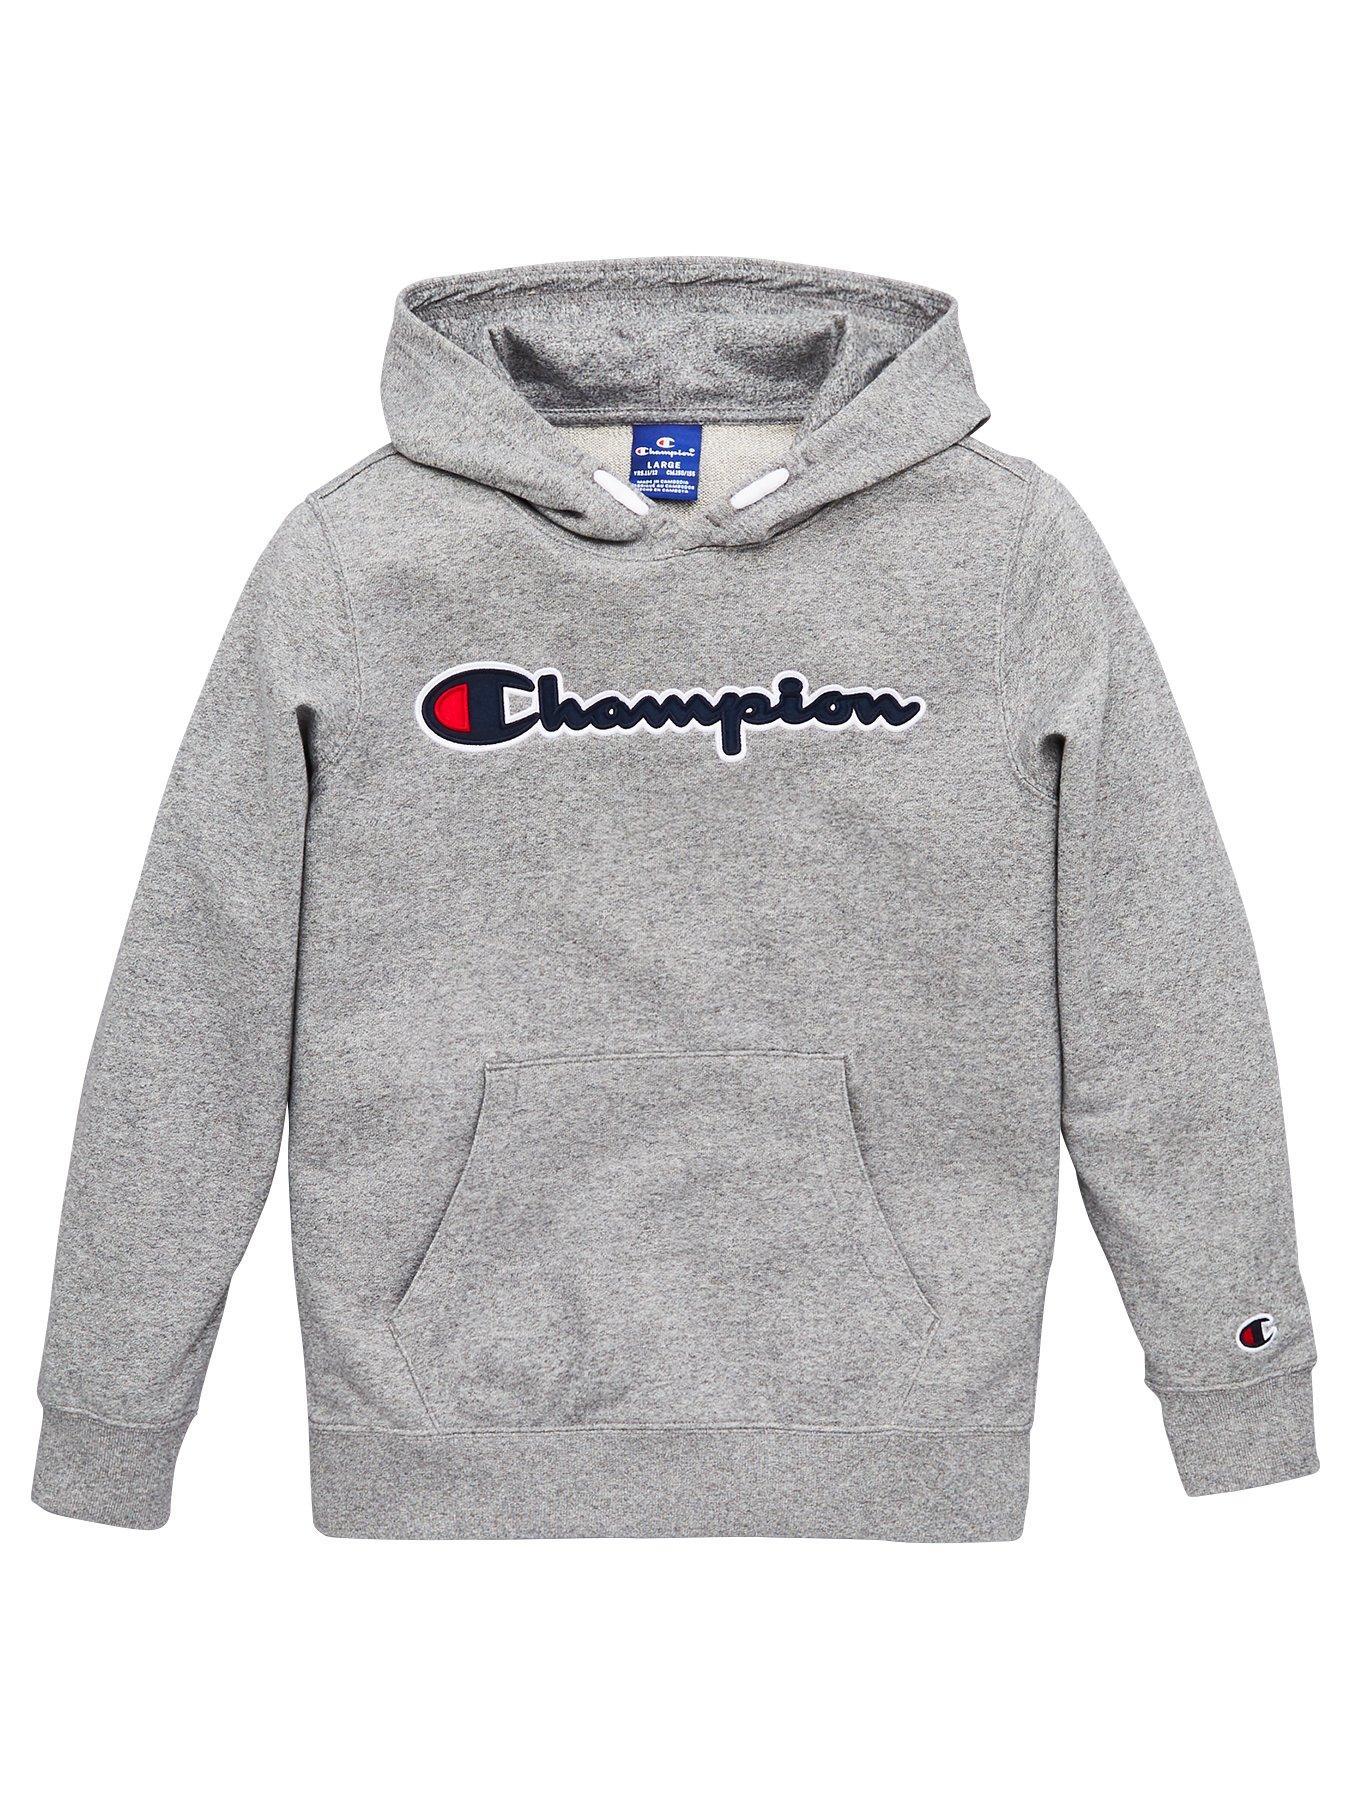 boys champion hoodie